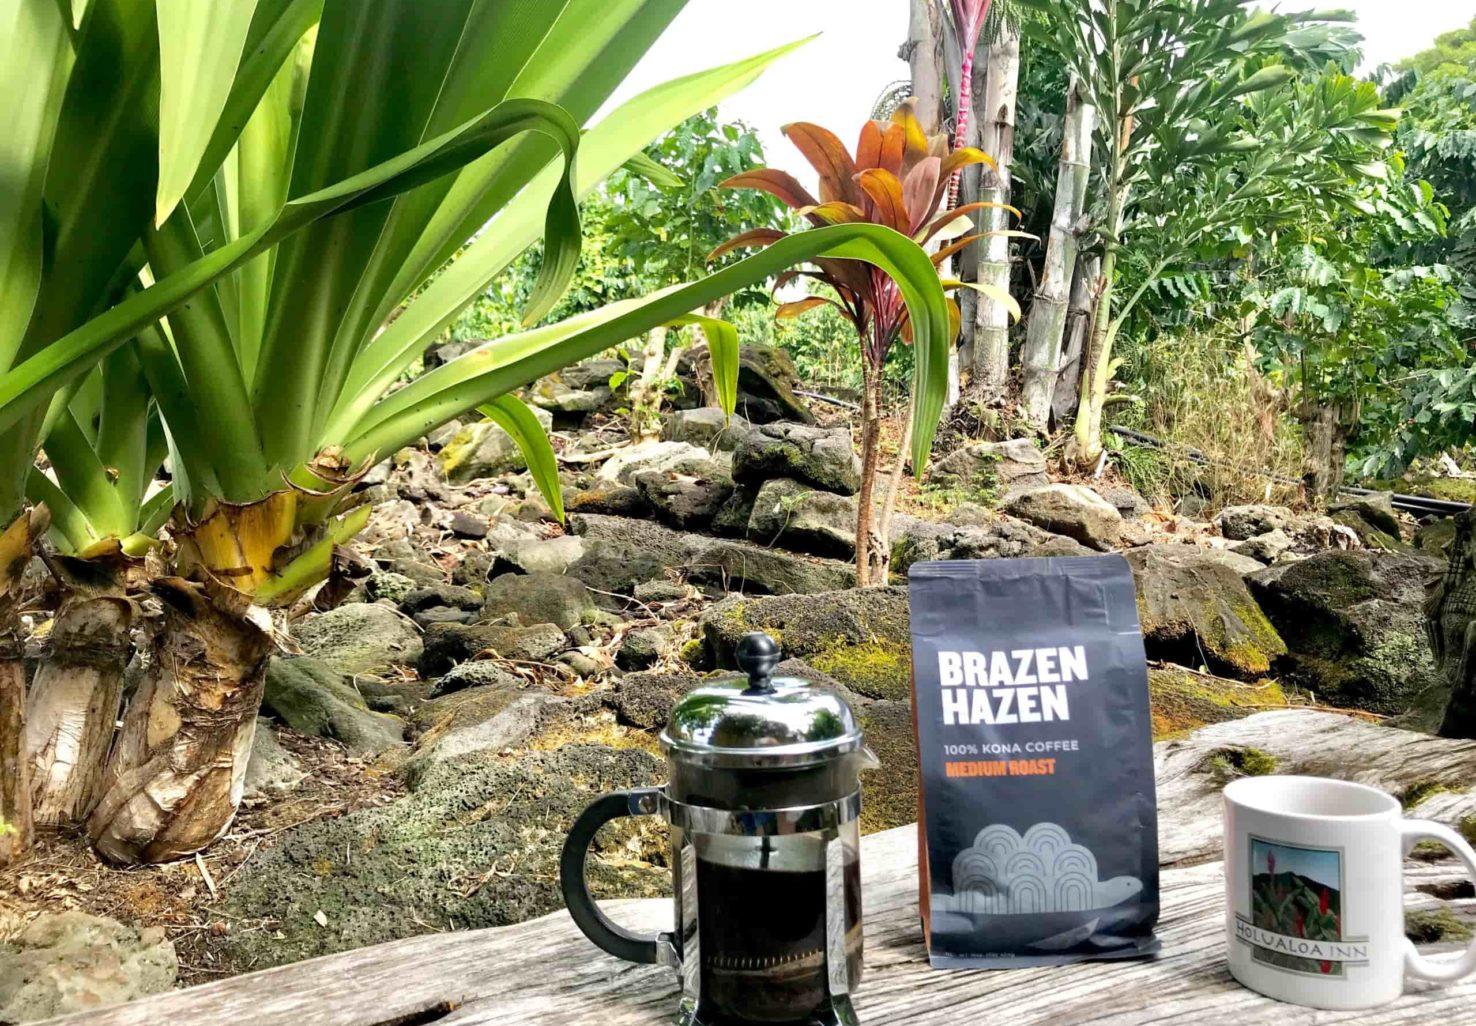 Brazen Hazen coffee, Holualoa Inn mug, and french press in tropical gardens